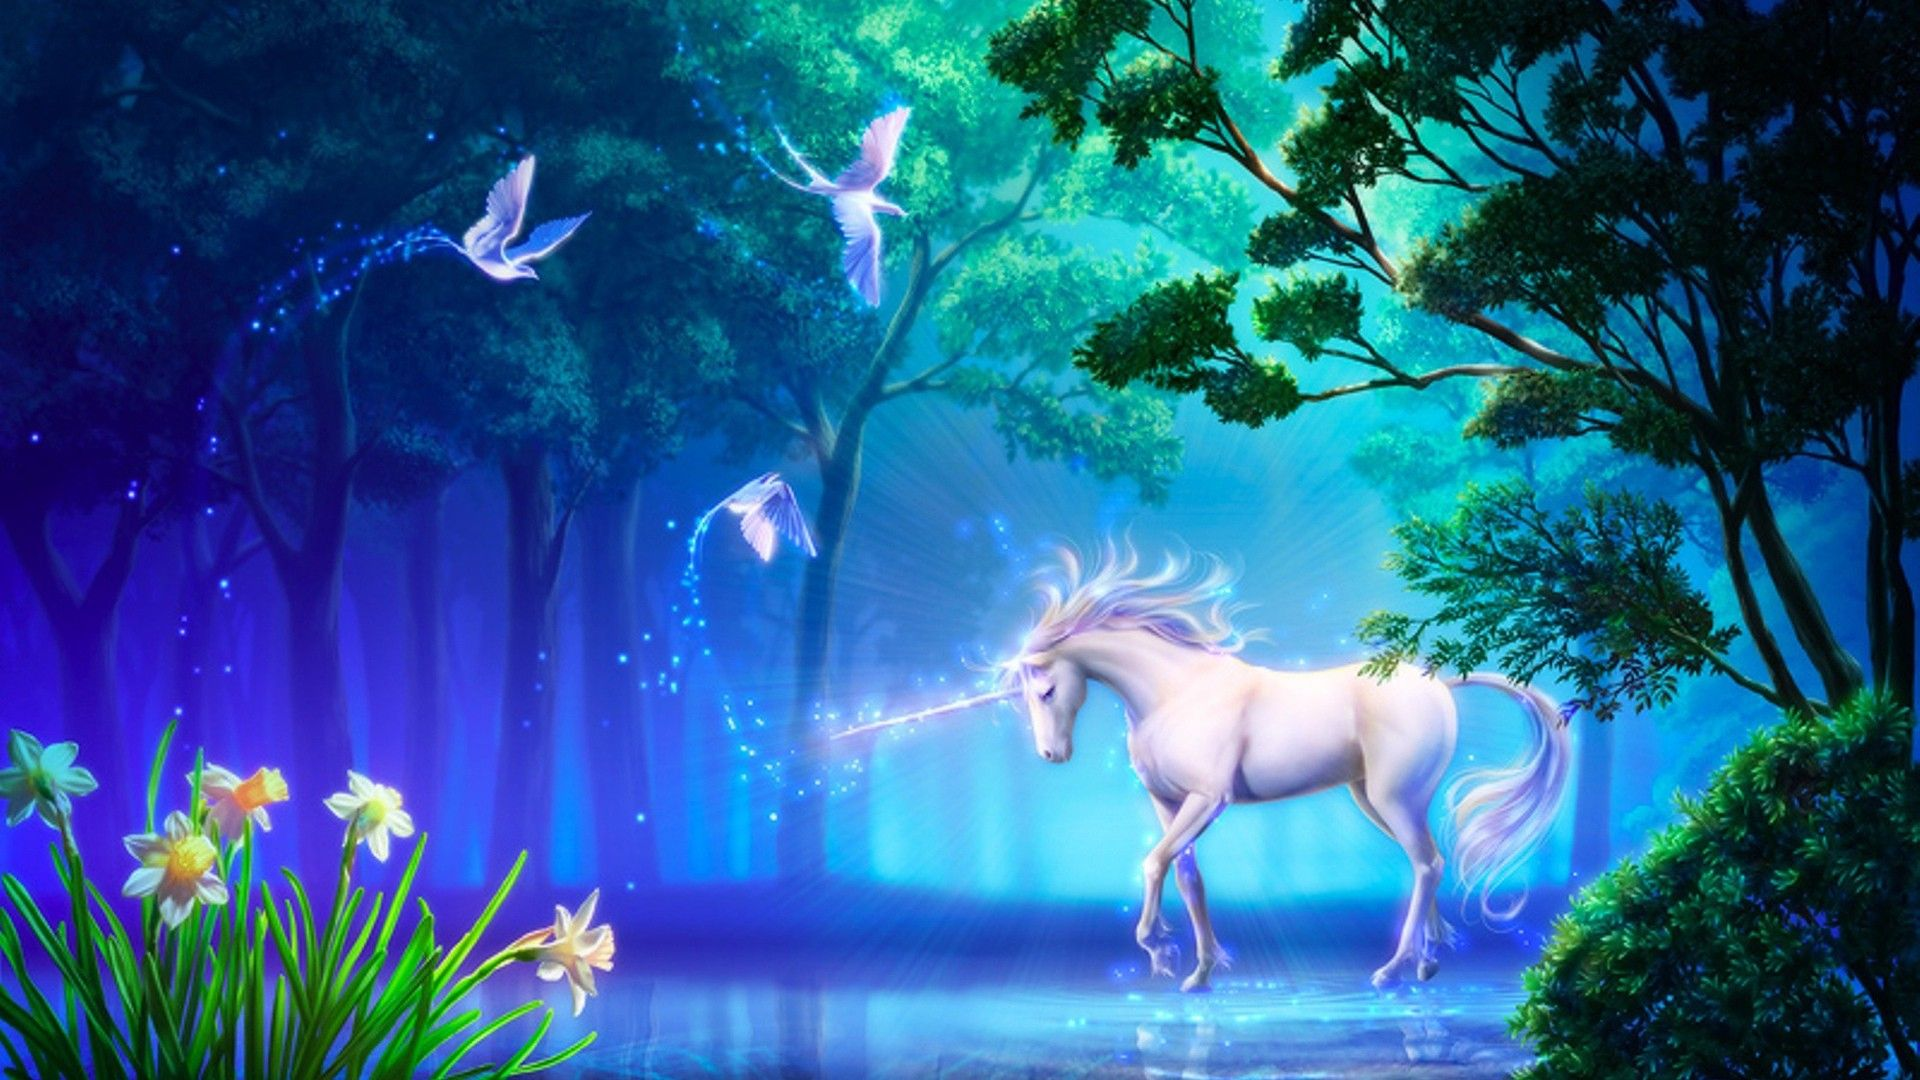 Best Wallpaper Horse Unicorn - c6f4703480c6d5f5eff074d13dd4dea6  Pic_288495.jpg